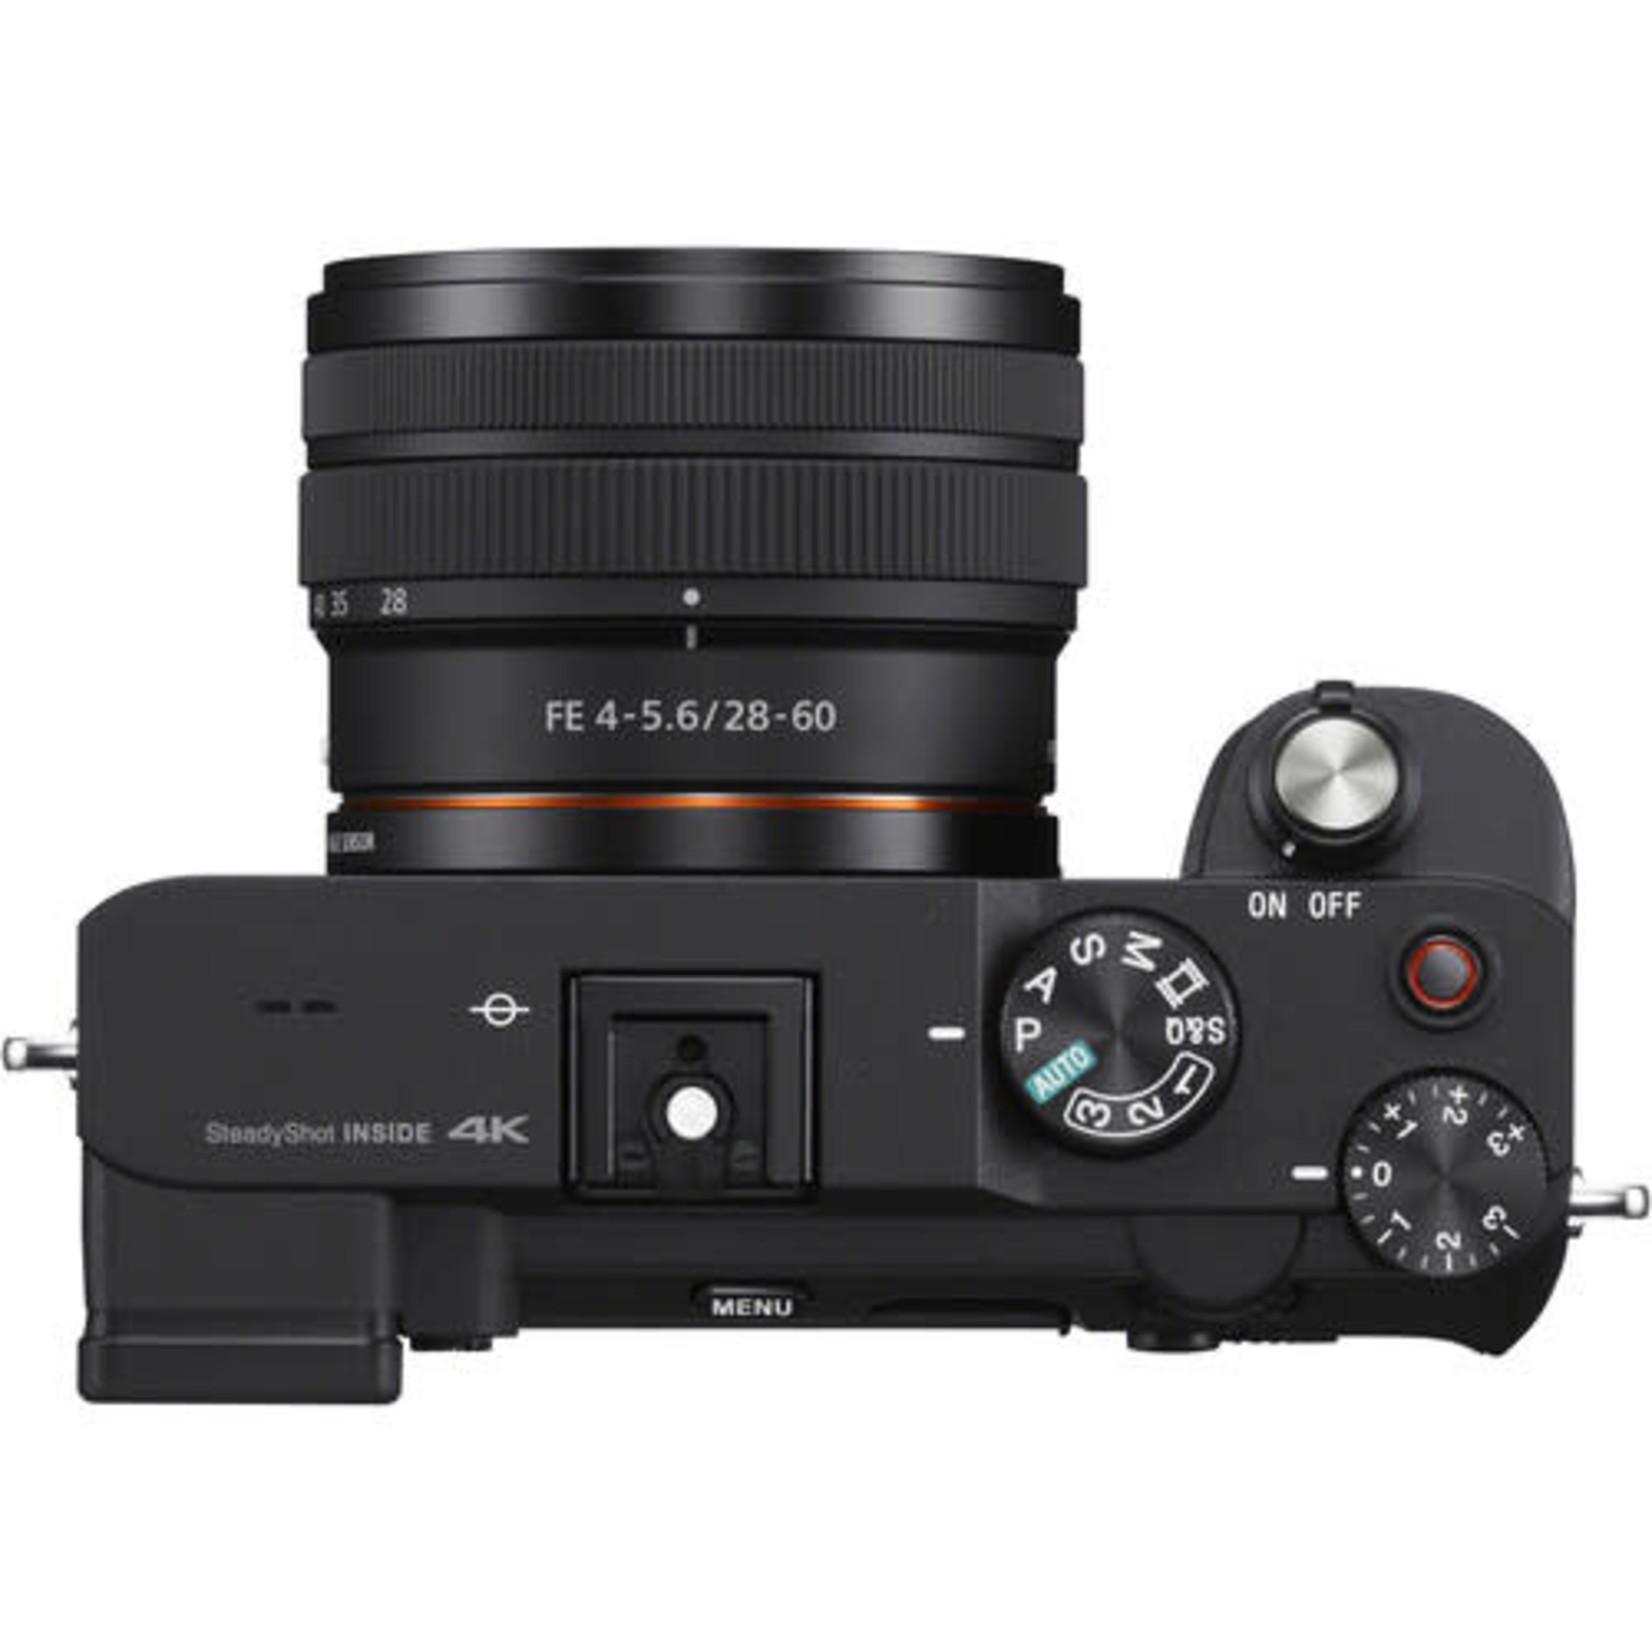 Sony Sony Alpha a7C Mirrorless Digital Camera with 28-60mm Lens (Black)